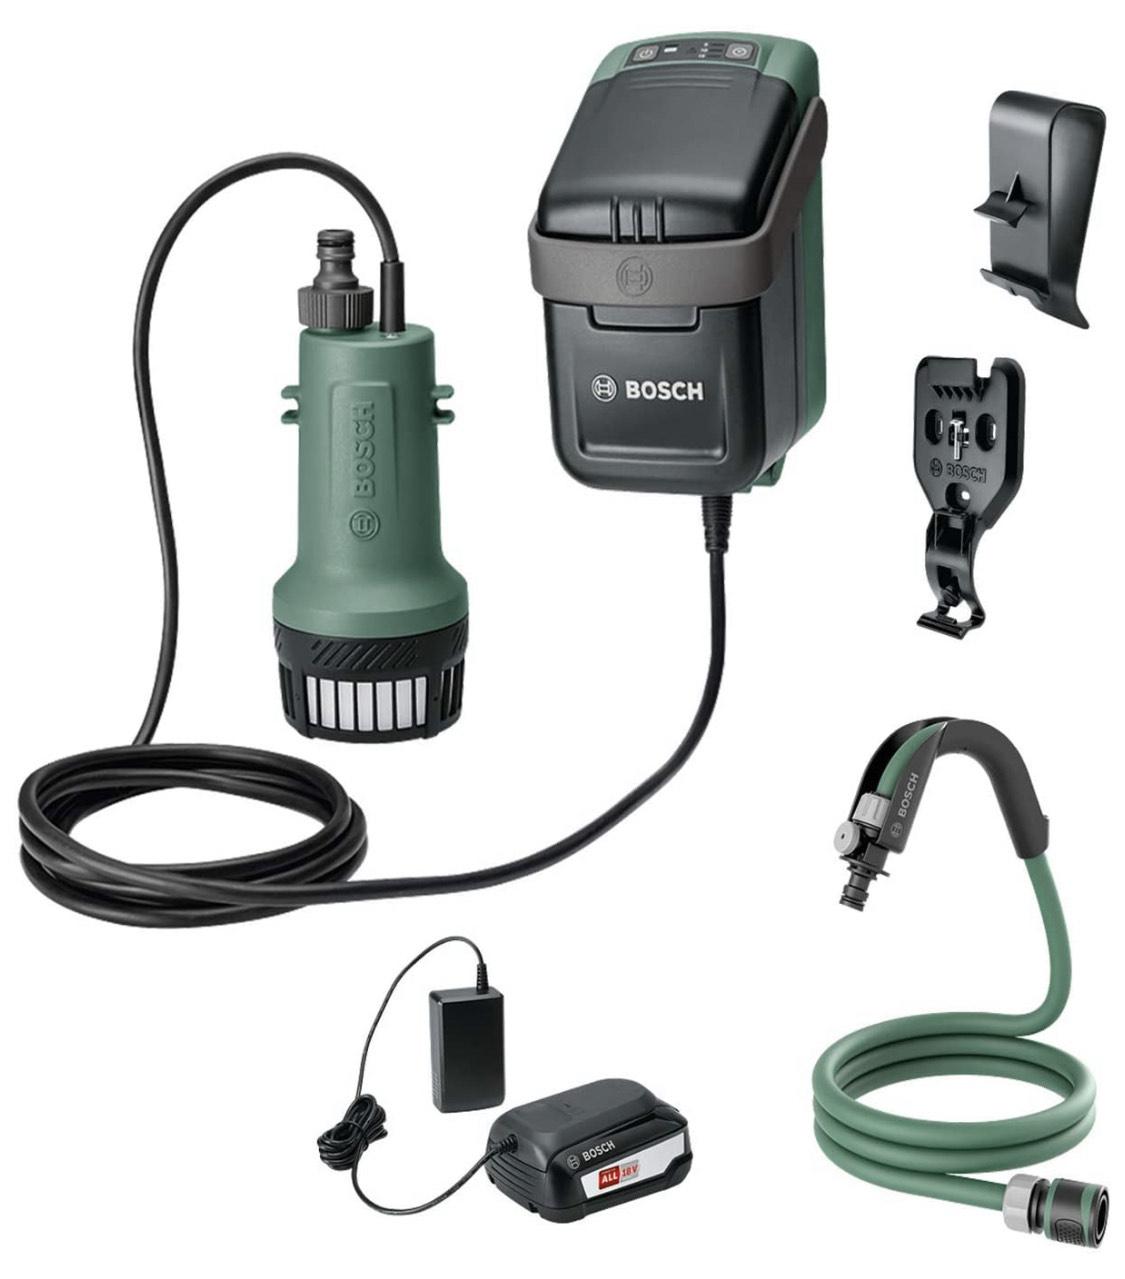 Bosch GardenPump 18 akkubetriebene Wasserpumpe mit 18V Akku + Ladegerät